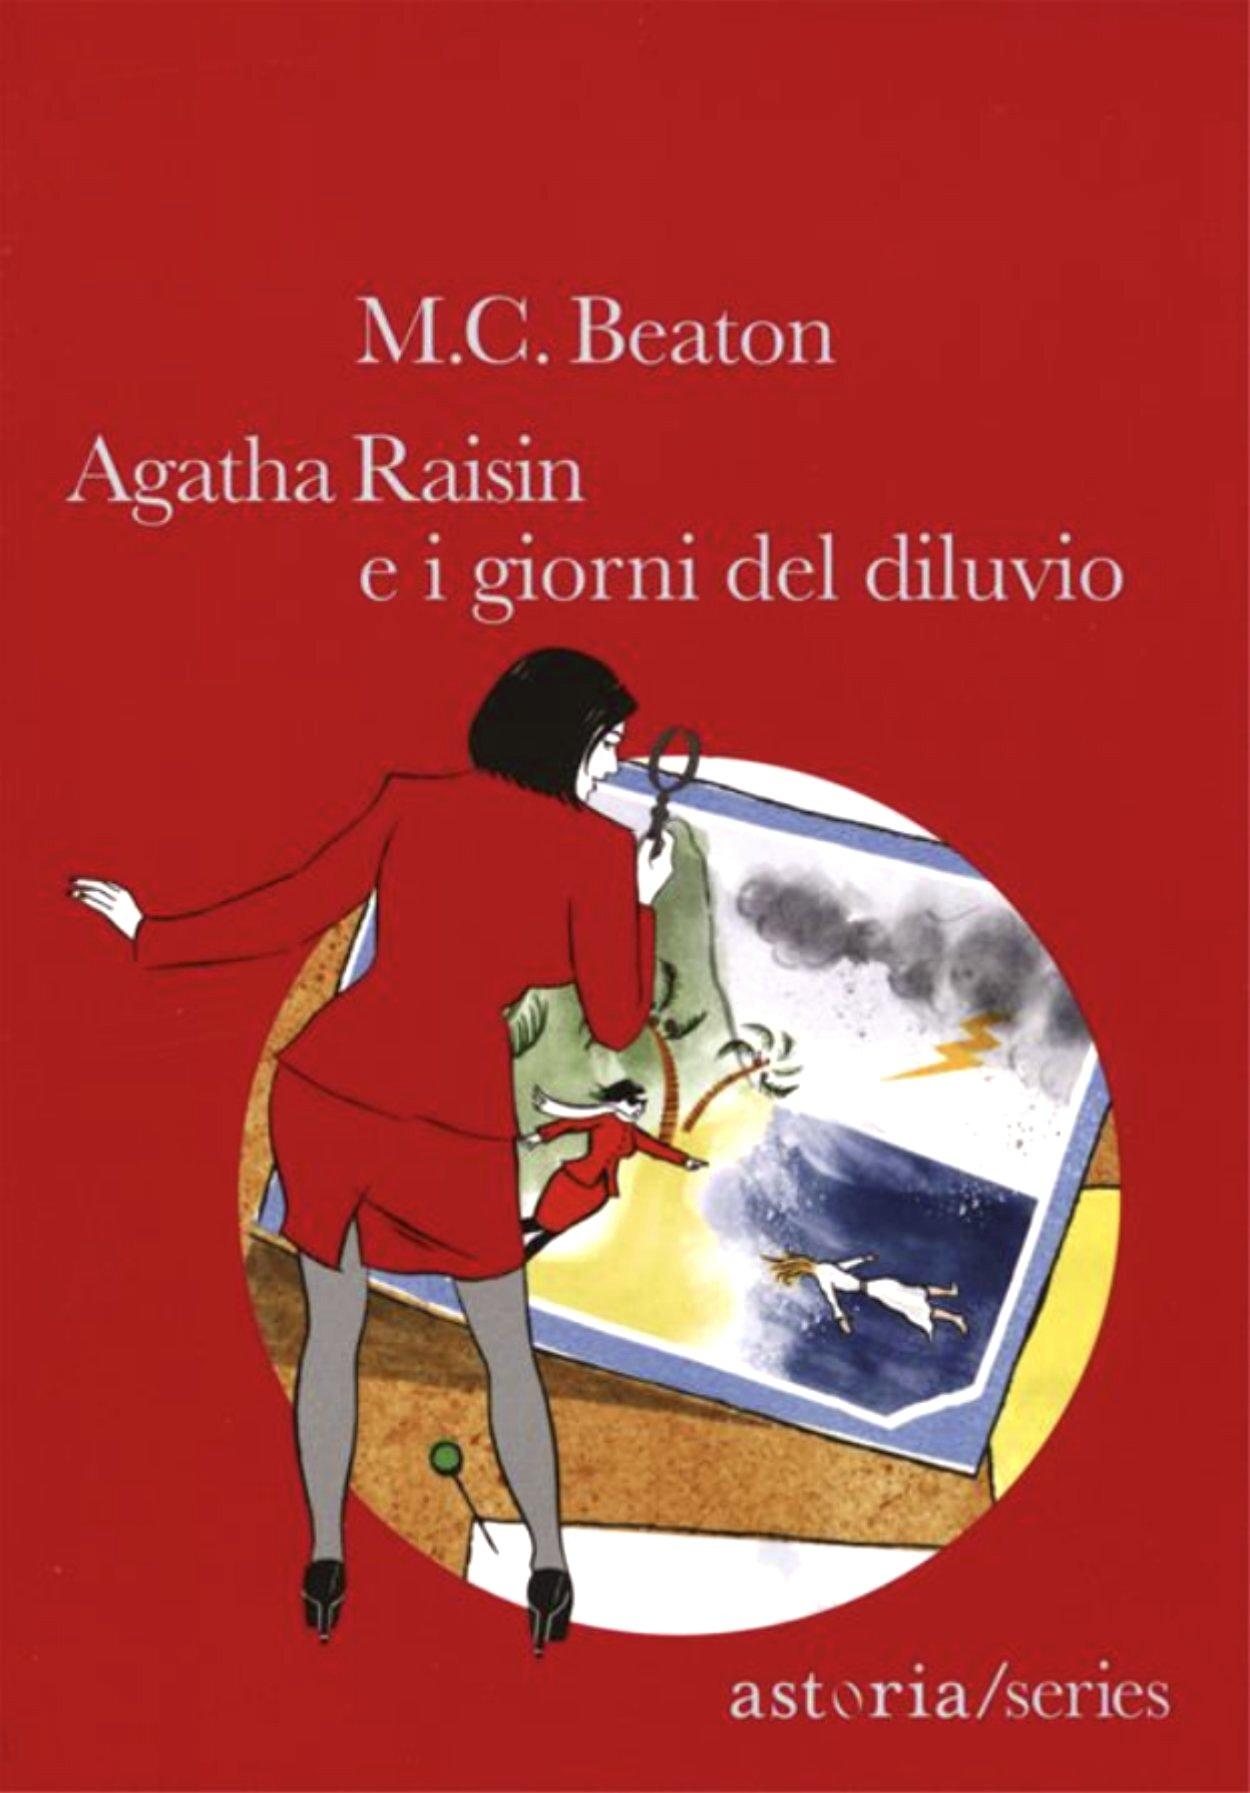 Agatha Raisin e i gi...